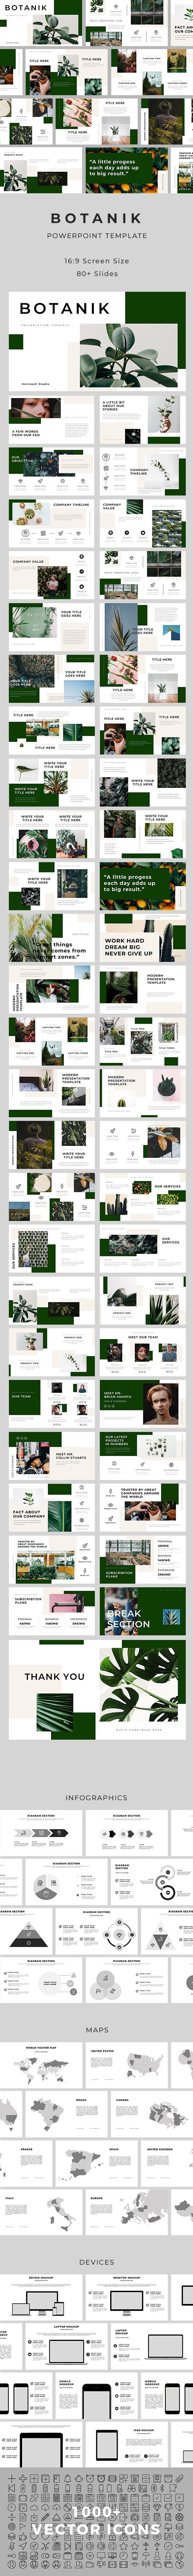 Botanik PowerPoint Template - PowerPoint Templates Presentation Templates